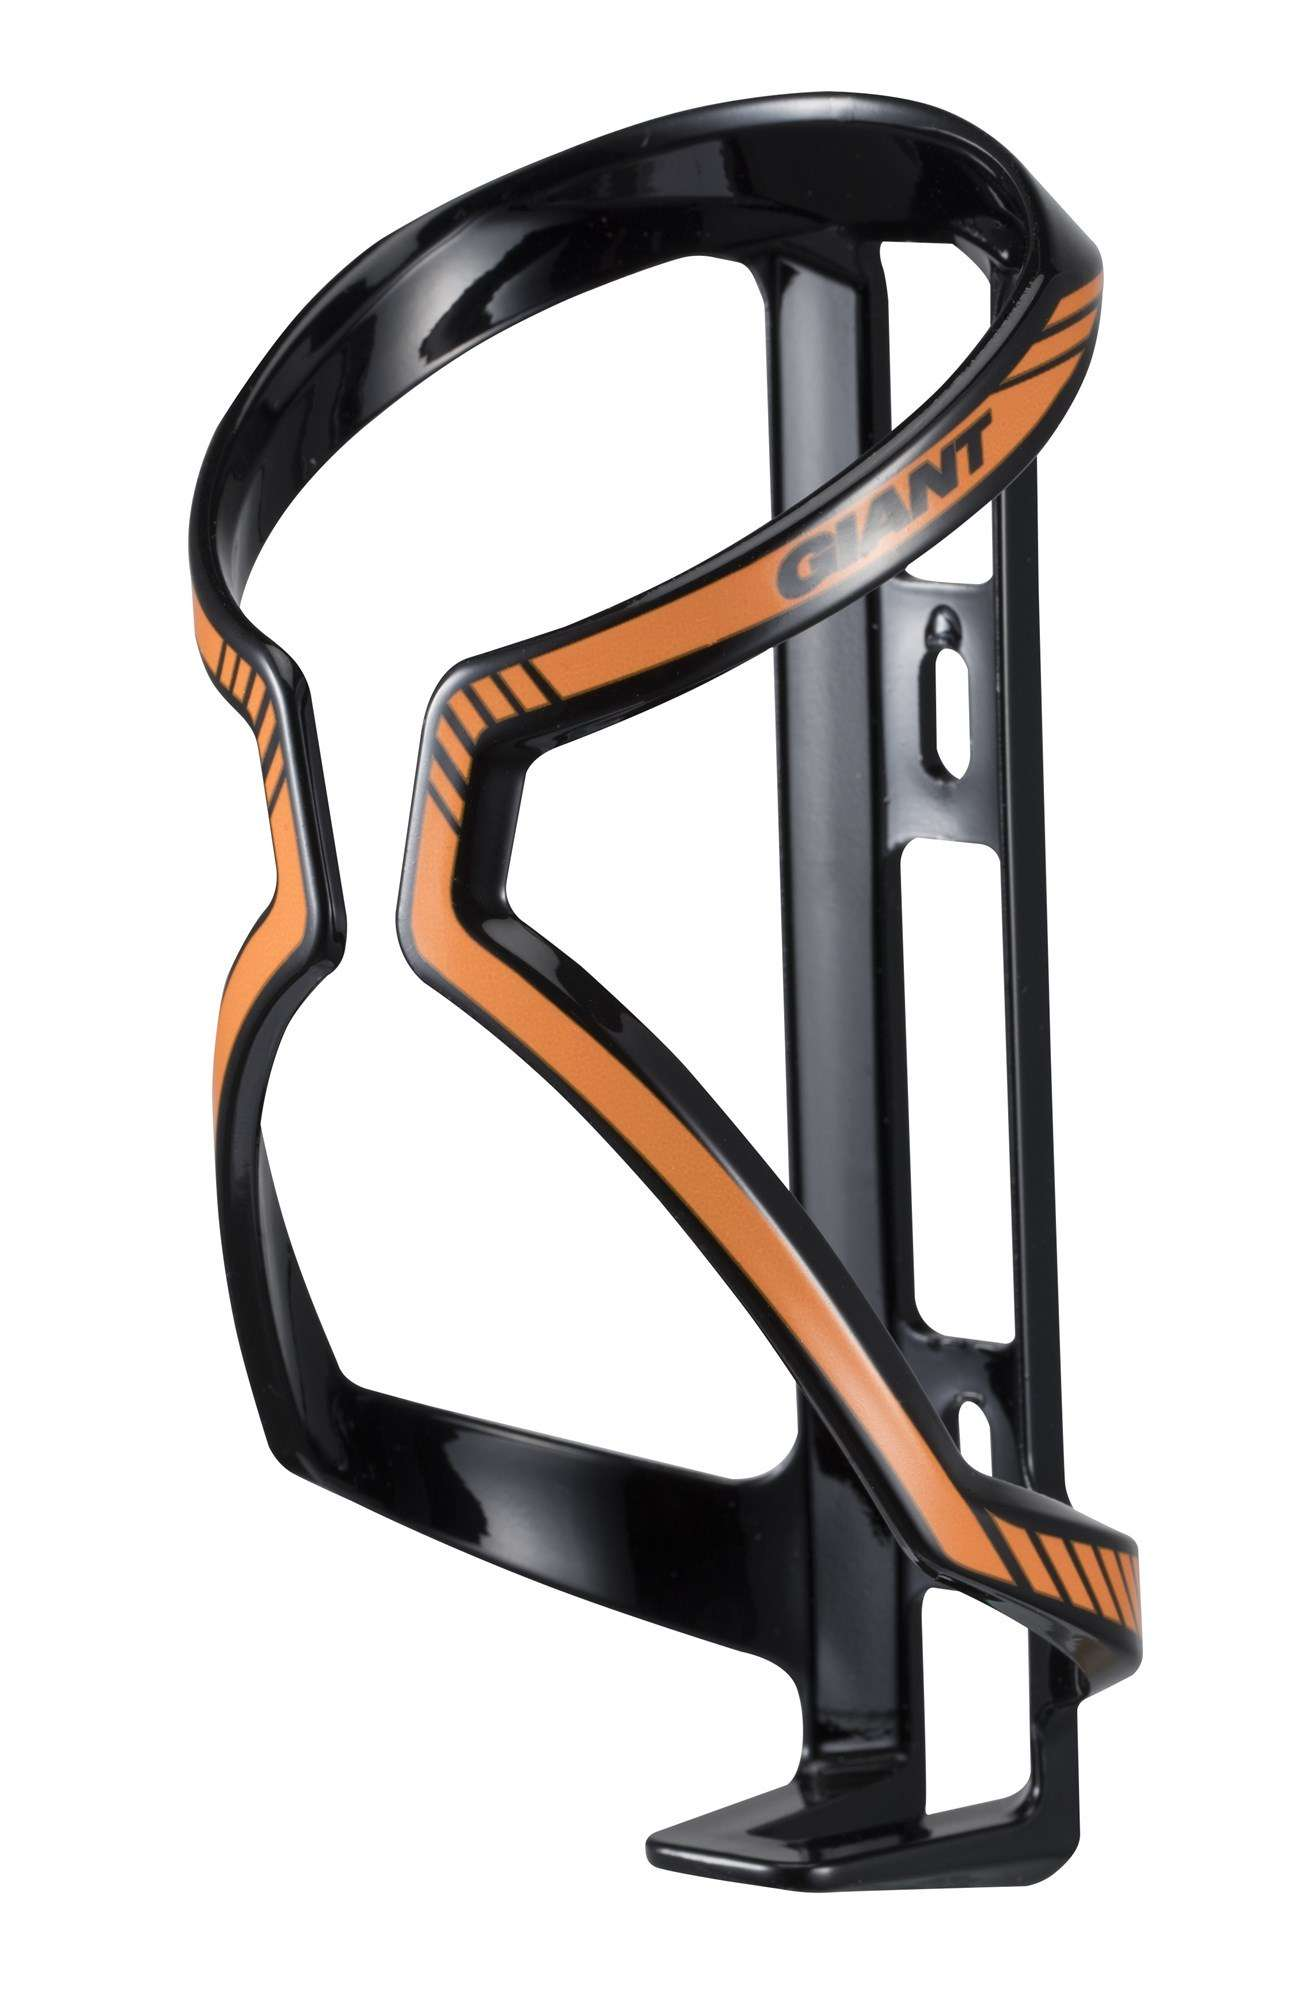 393cb9dab8 Giant Airway Sport Bottle Cage Black-Orange | George's Bike Shop